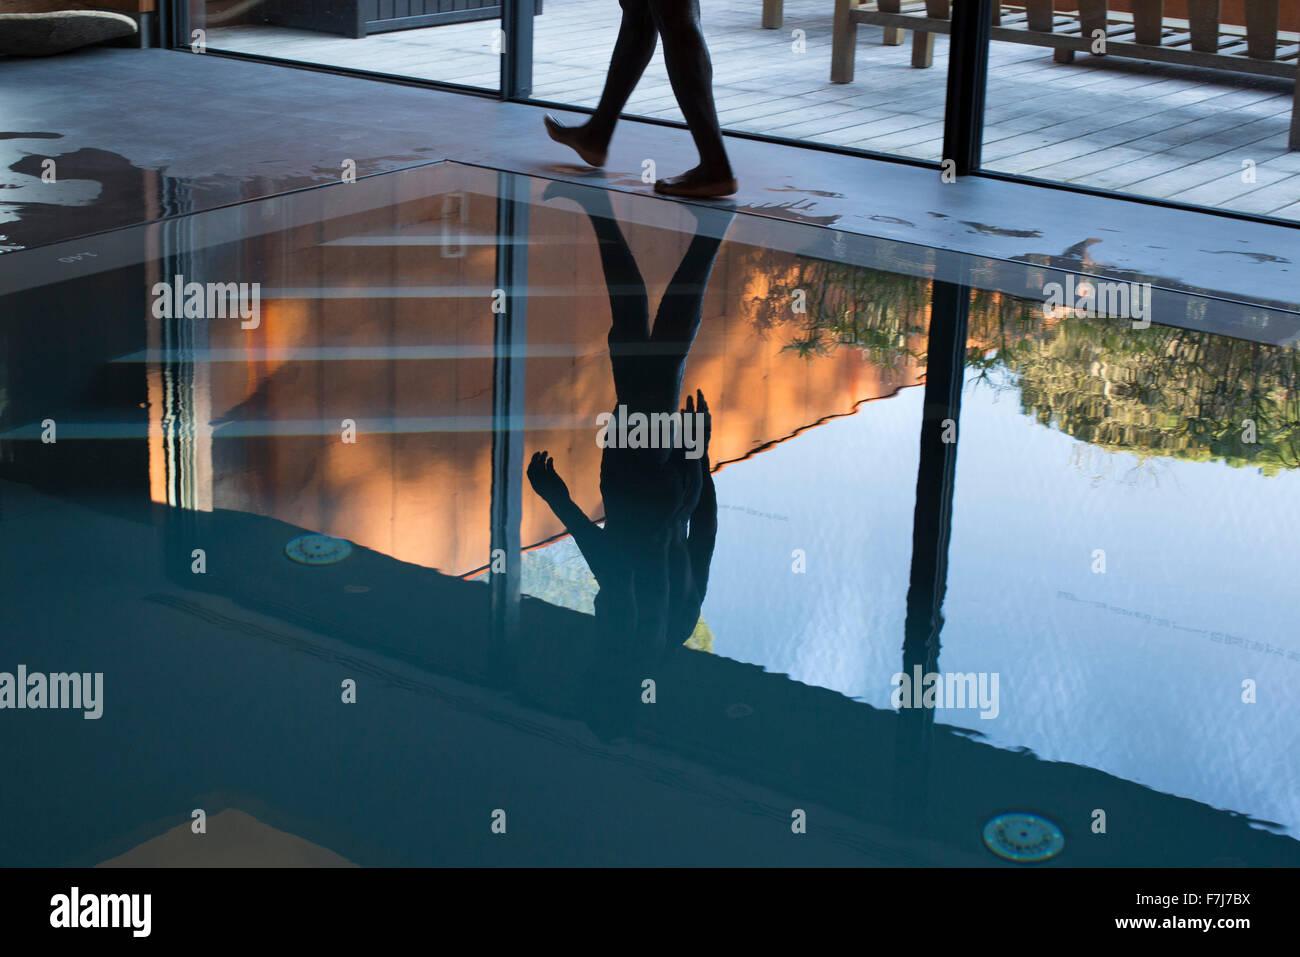 Man walking beside pool, reflected on water - Stock Image